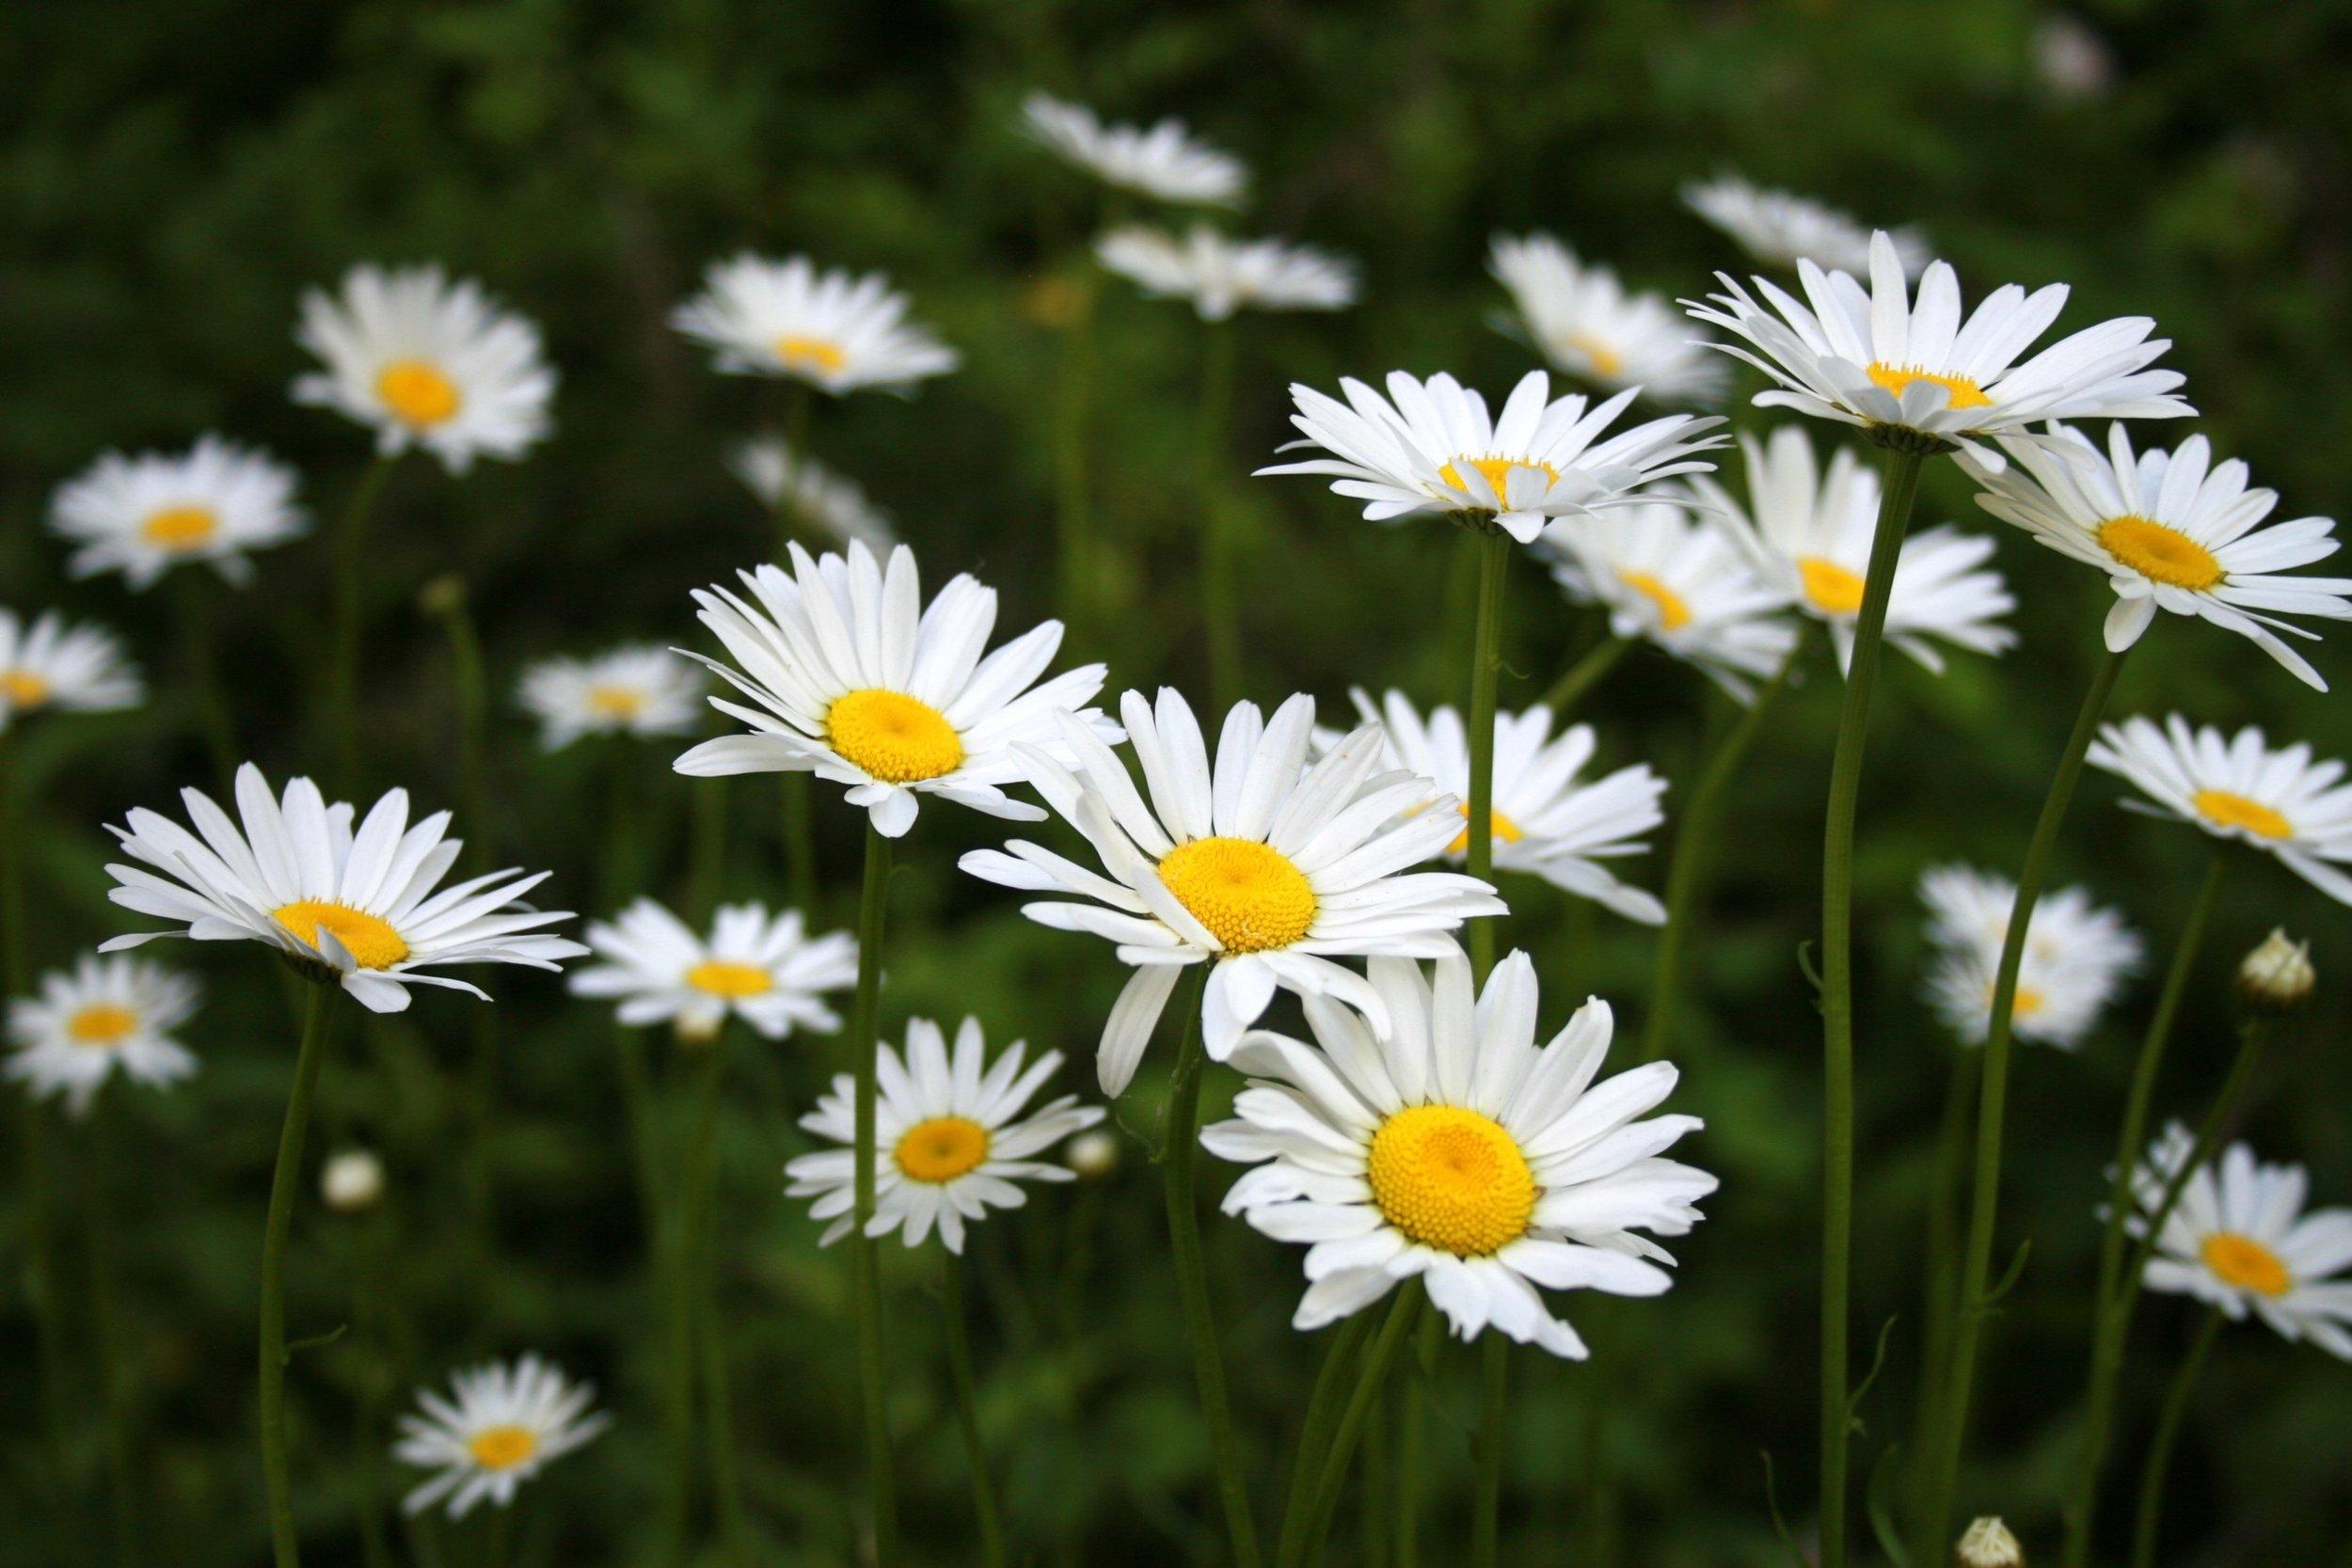 daisies-nature-park-summer-floral-flower-daisy.jpg